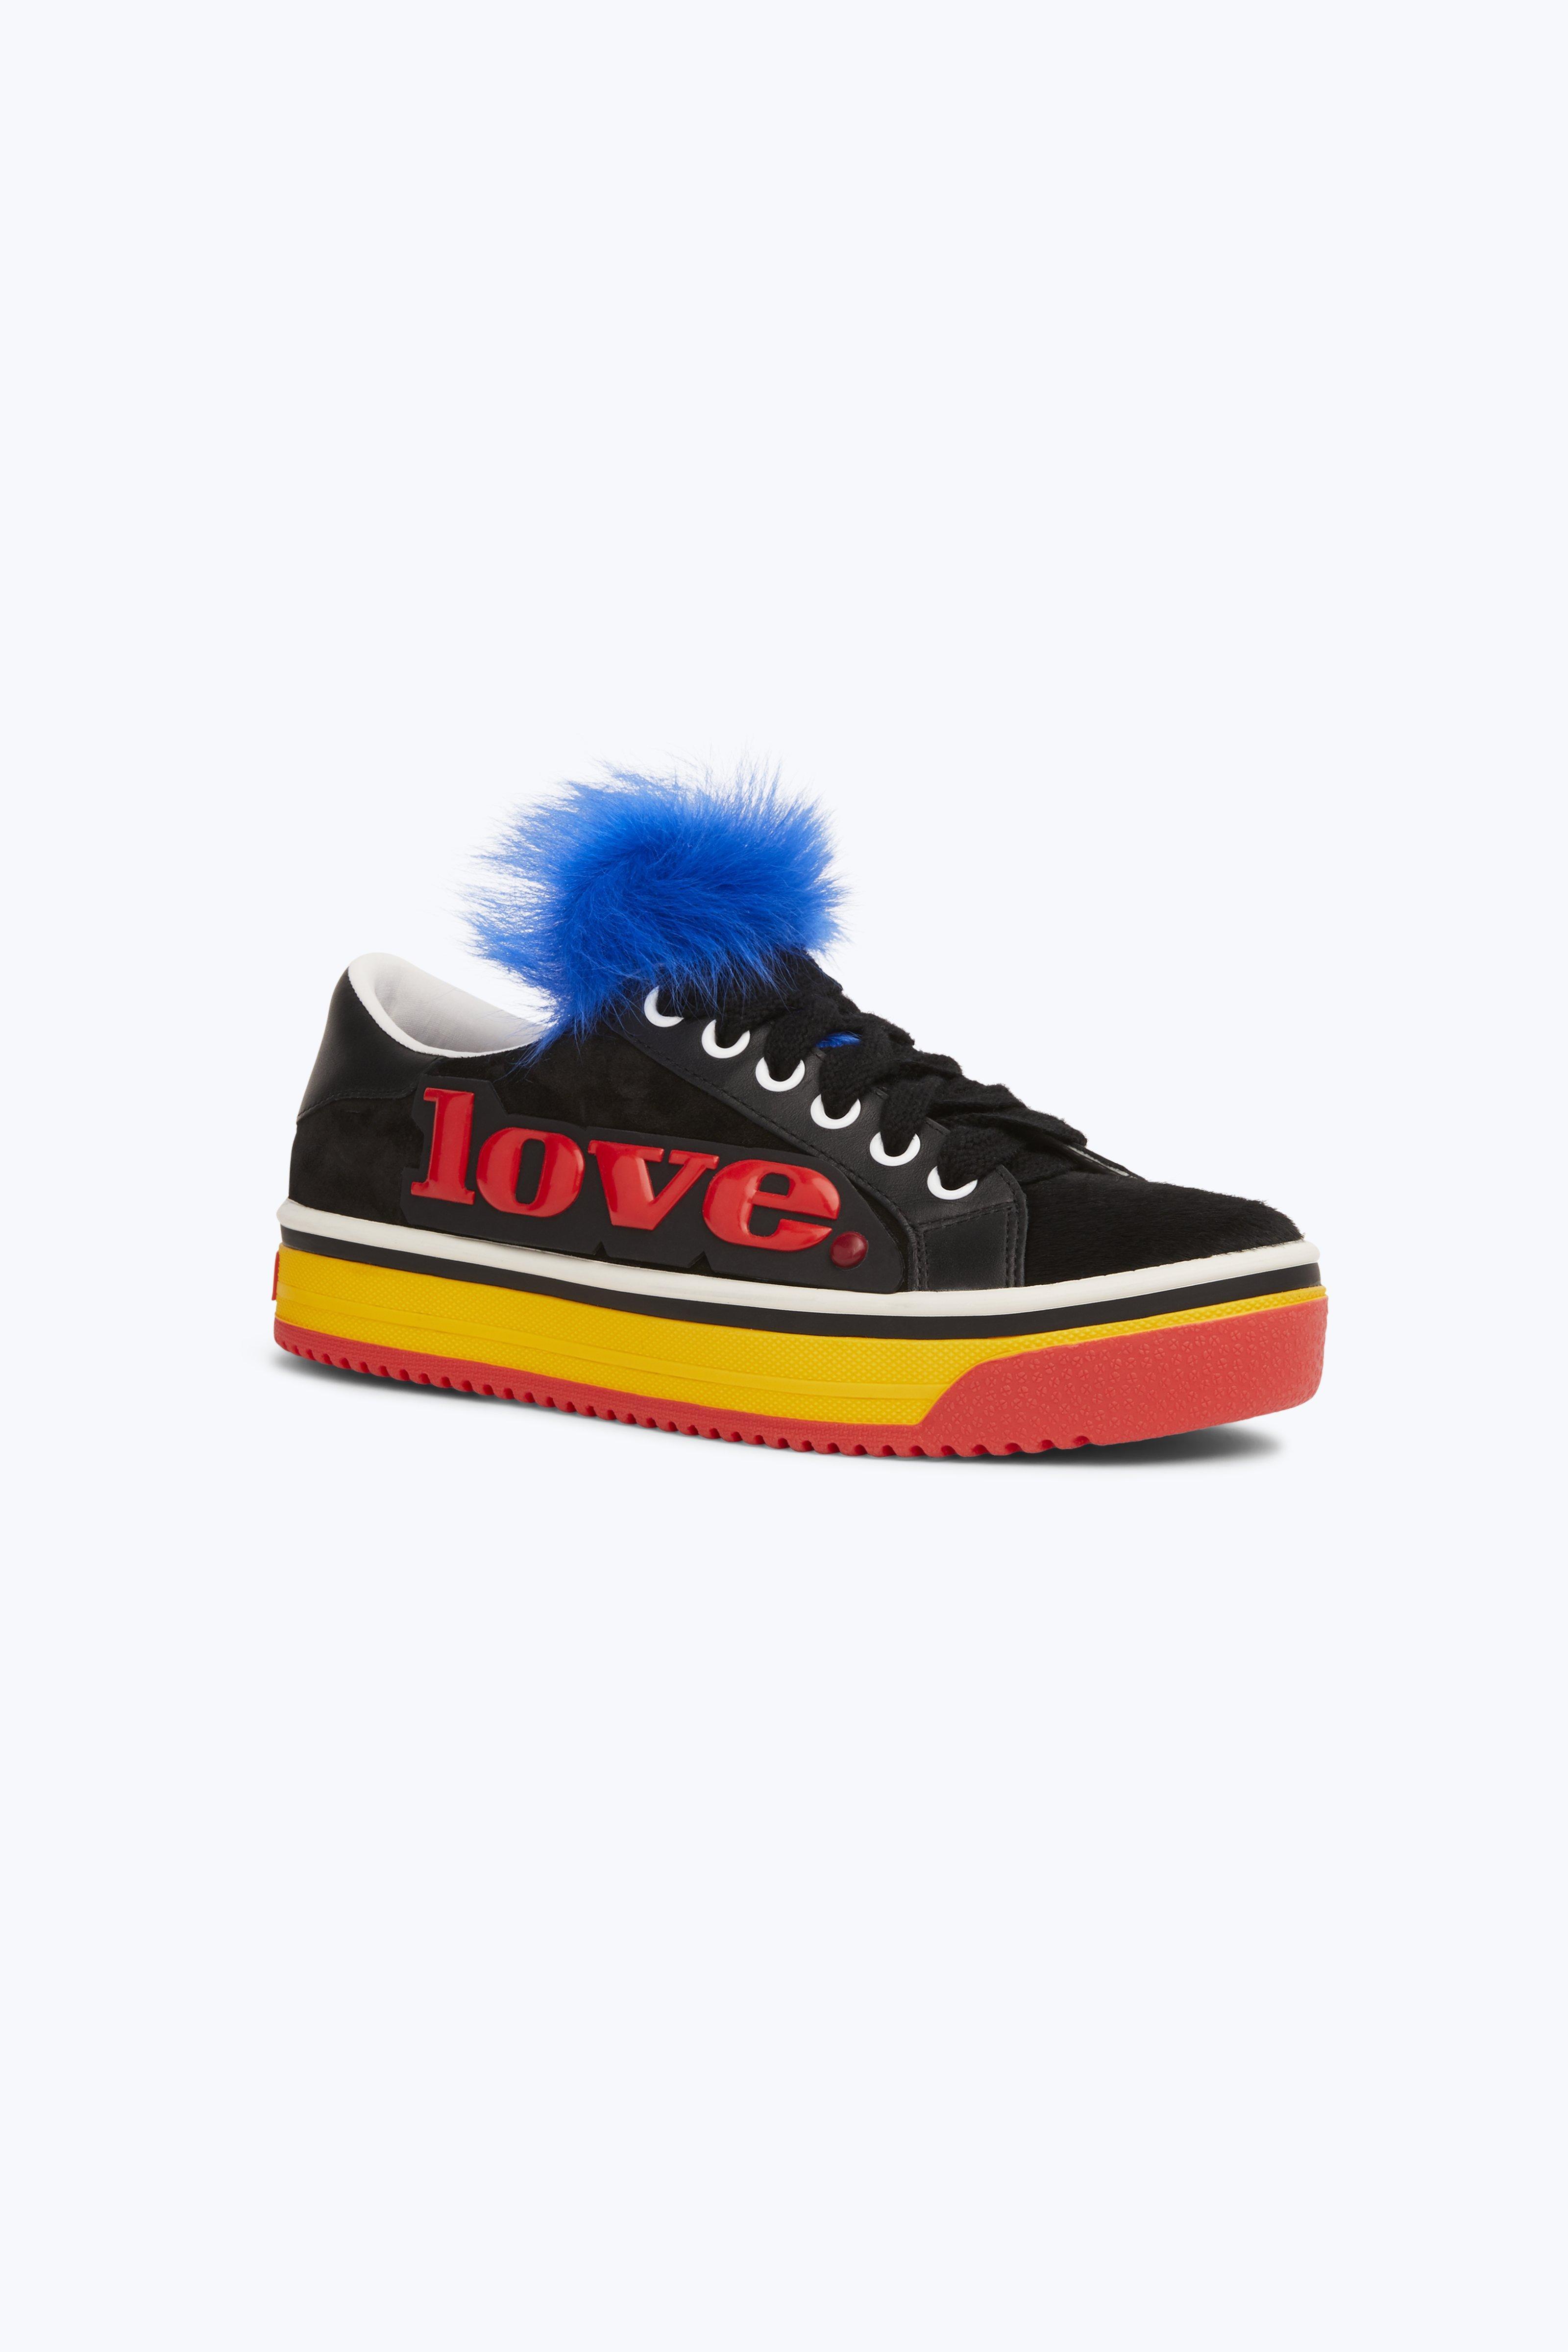 Empire Love Genuine Shearling & Calf Hair Trim Sneaker in Black